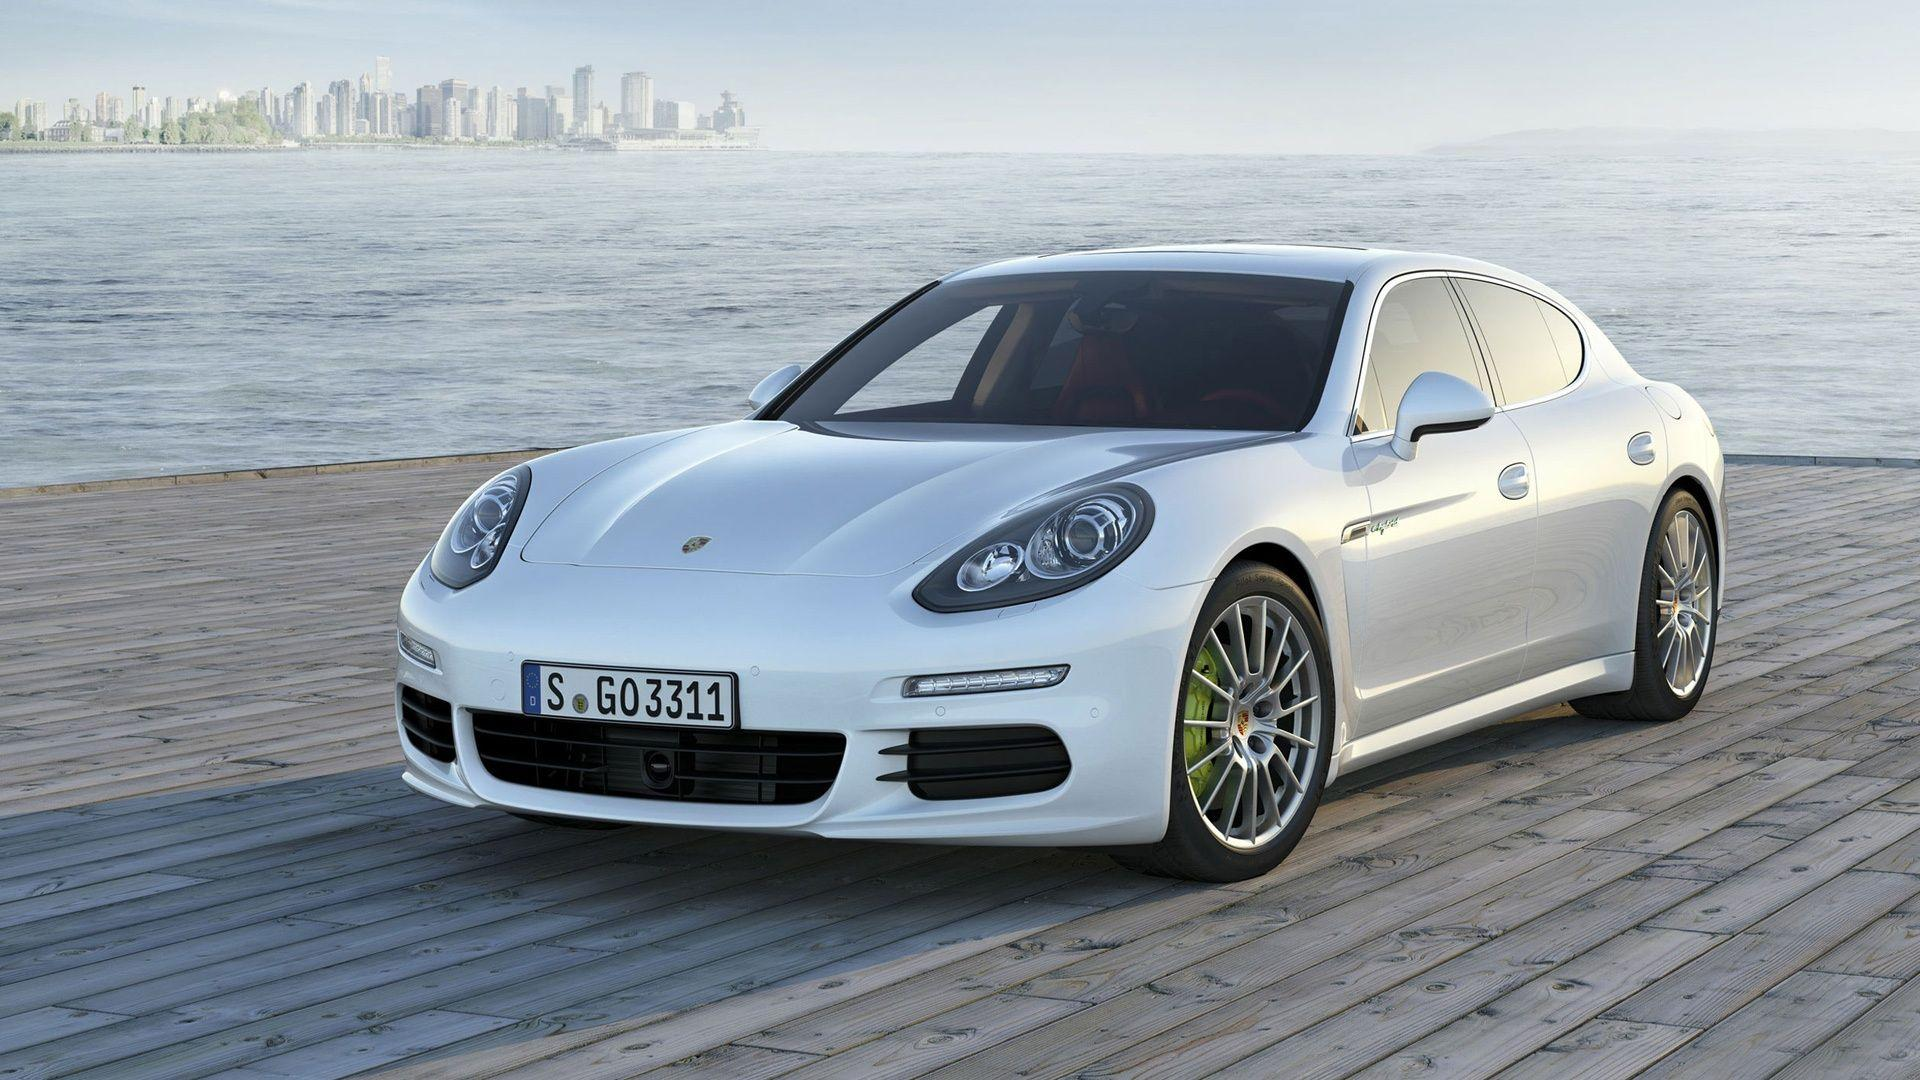 Porsche Panamera Wallpapers Wallpaper Cave